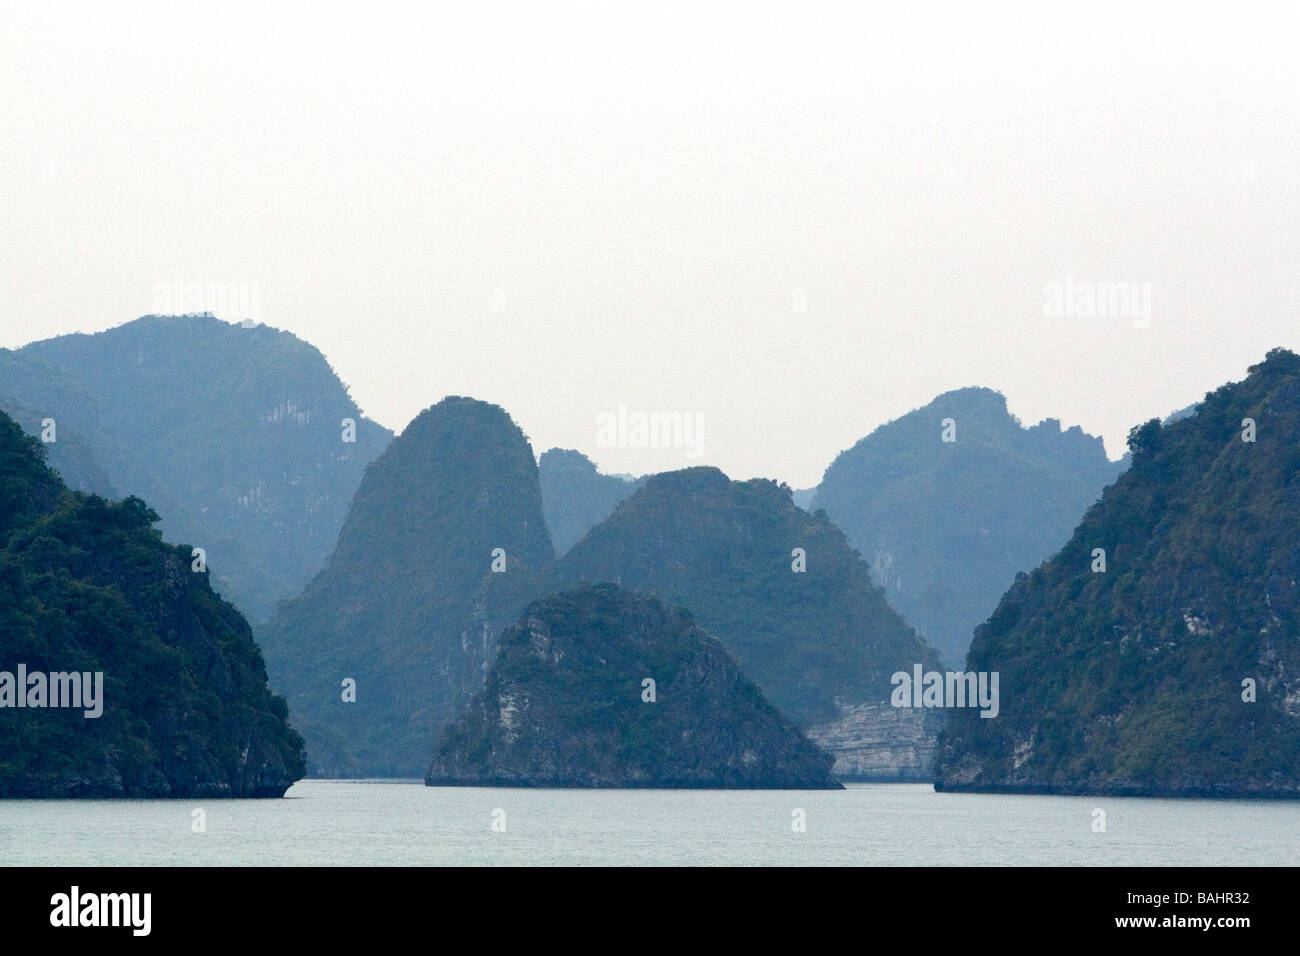 Misty morning views of Ha Long Bay Vietnam - Stock Image